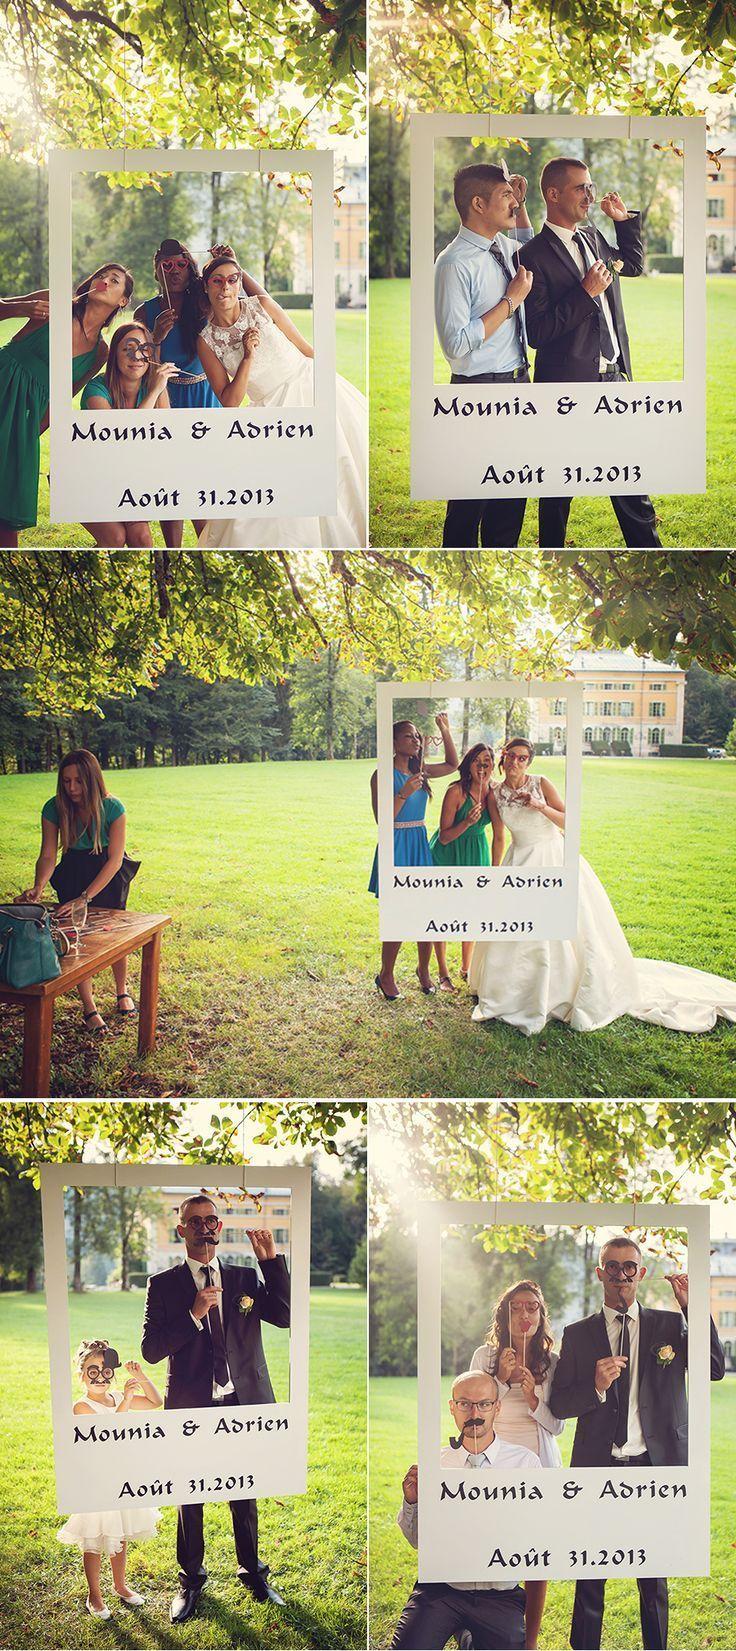 DIY Wedding: 30 Ideas for an Original Photobahn – #DIY #a #Photo # for #Wedding …